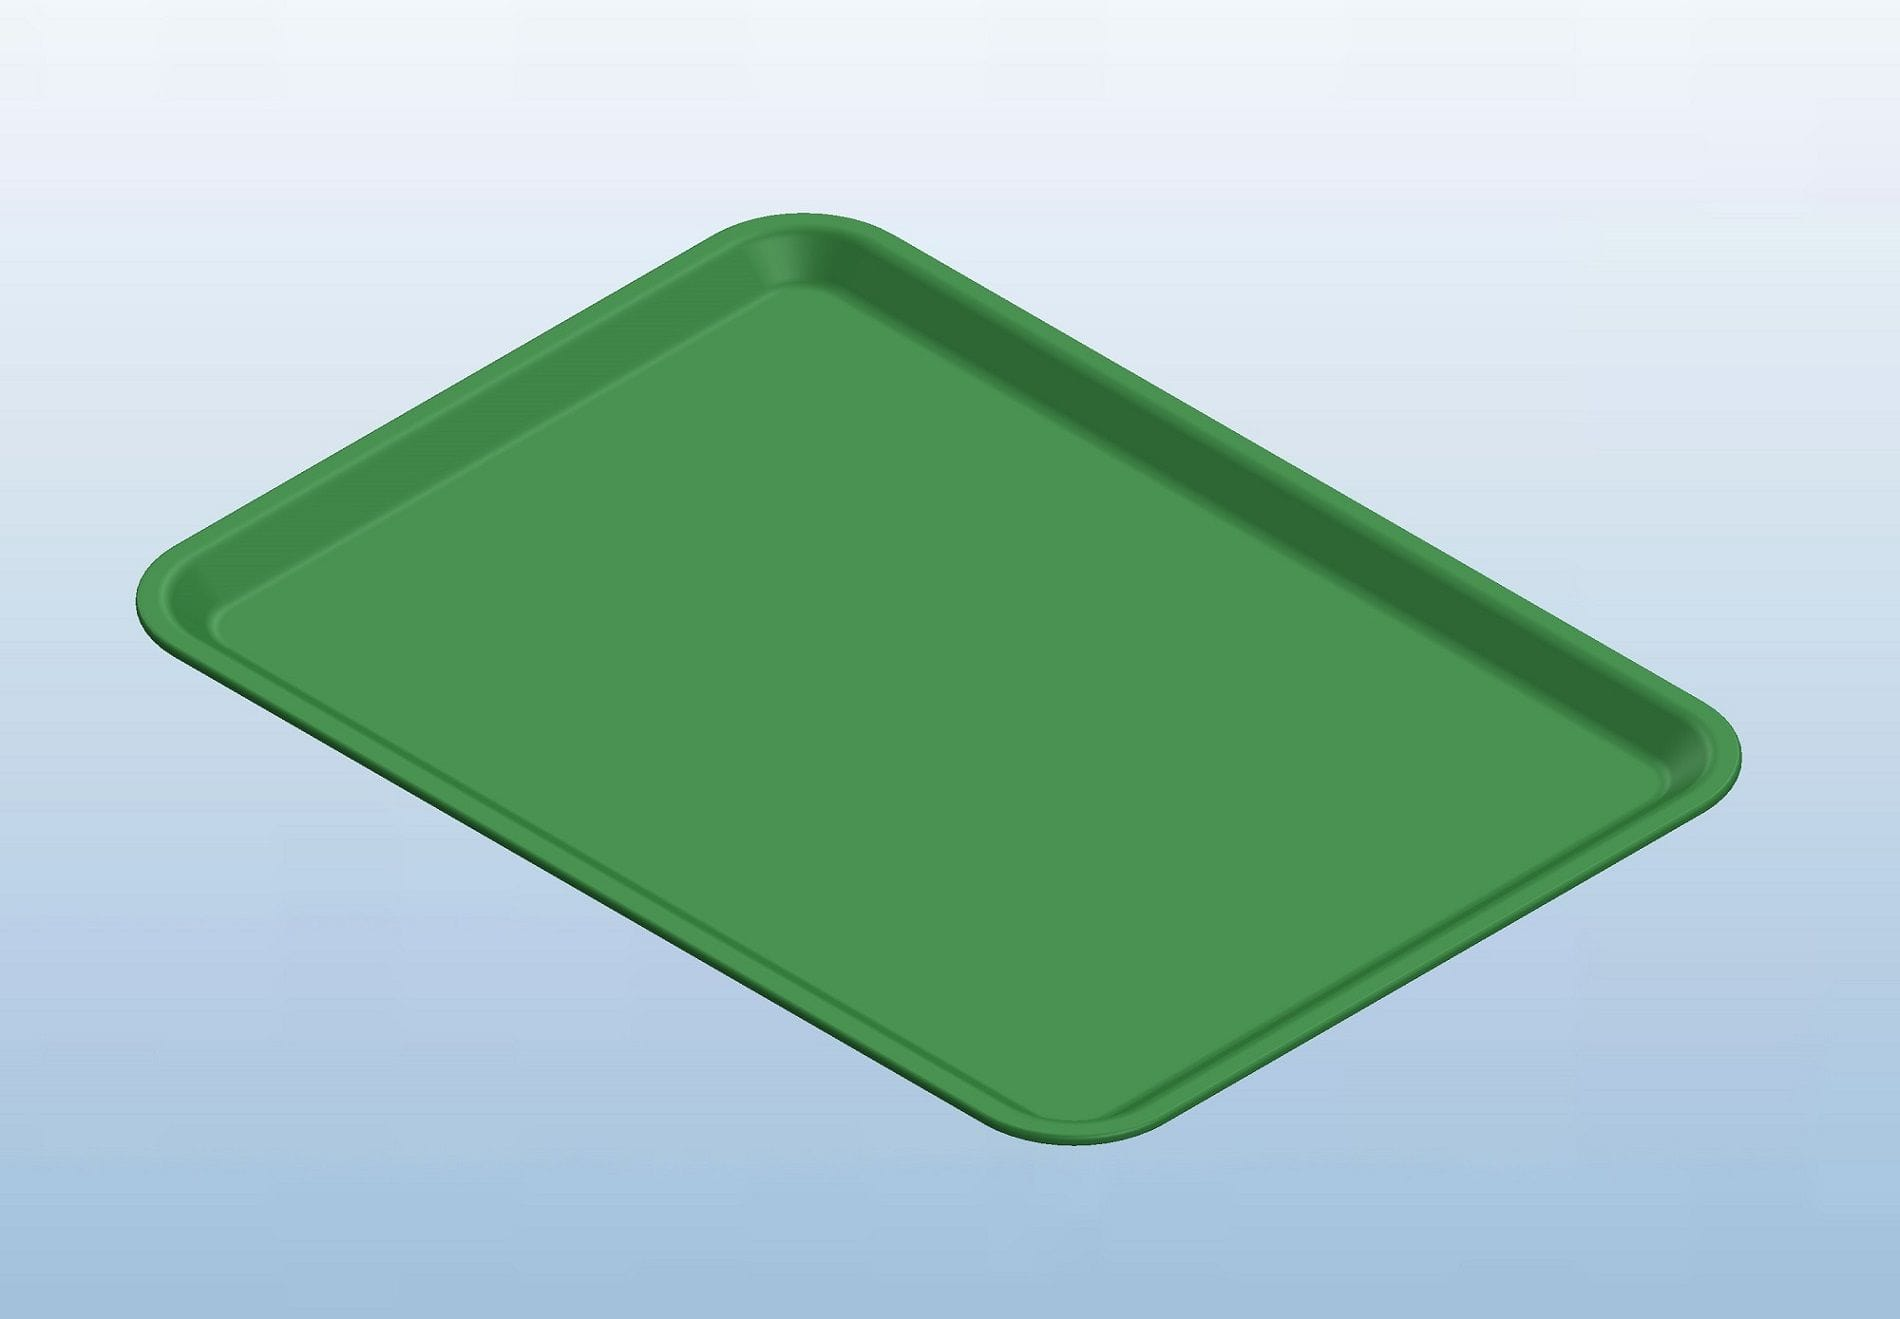 Green Dietary Trays